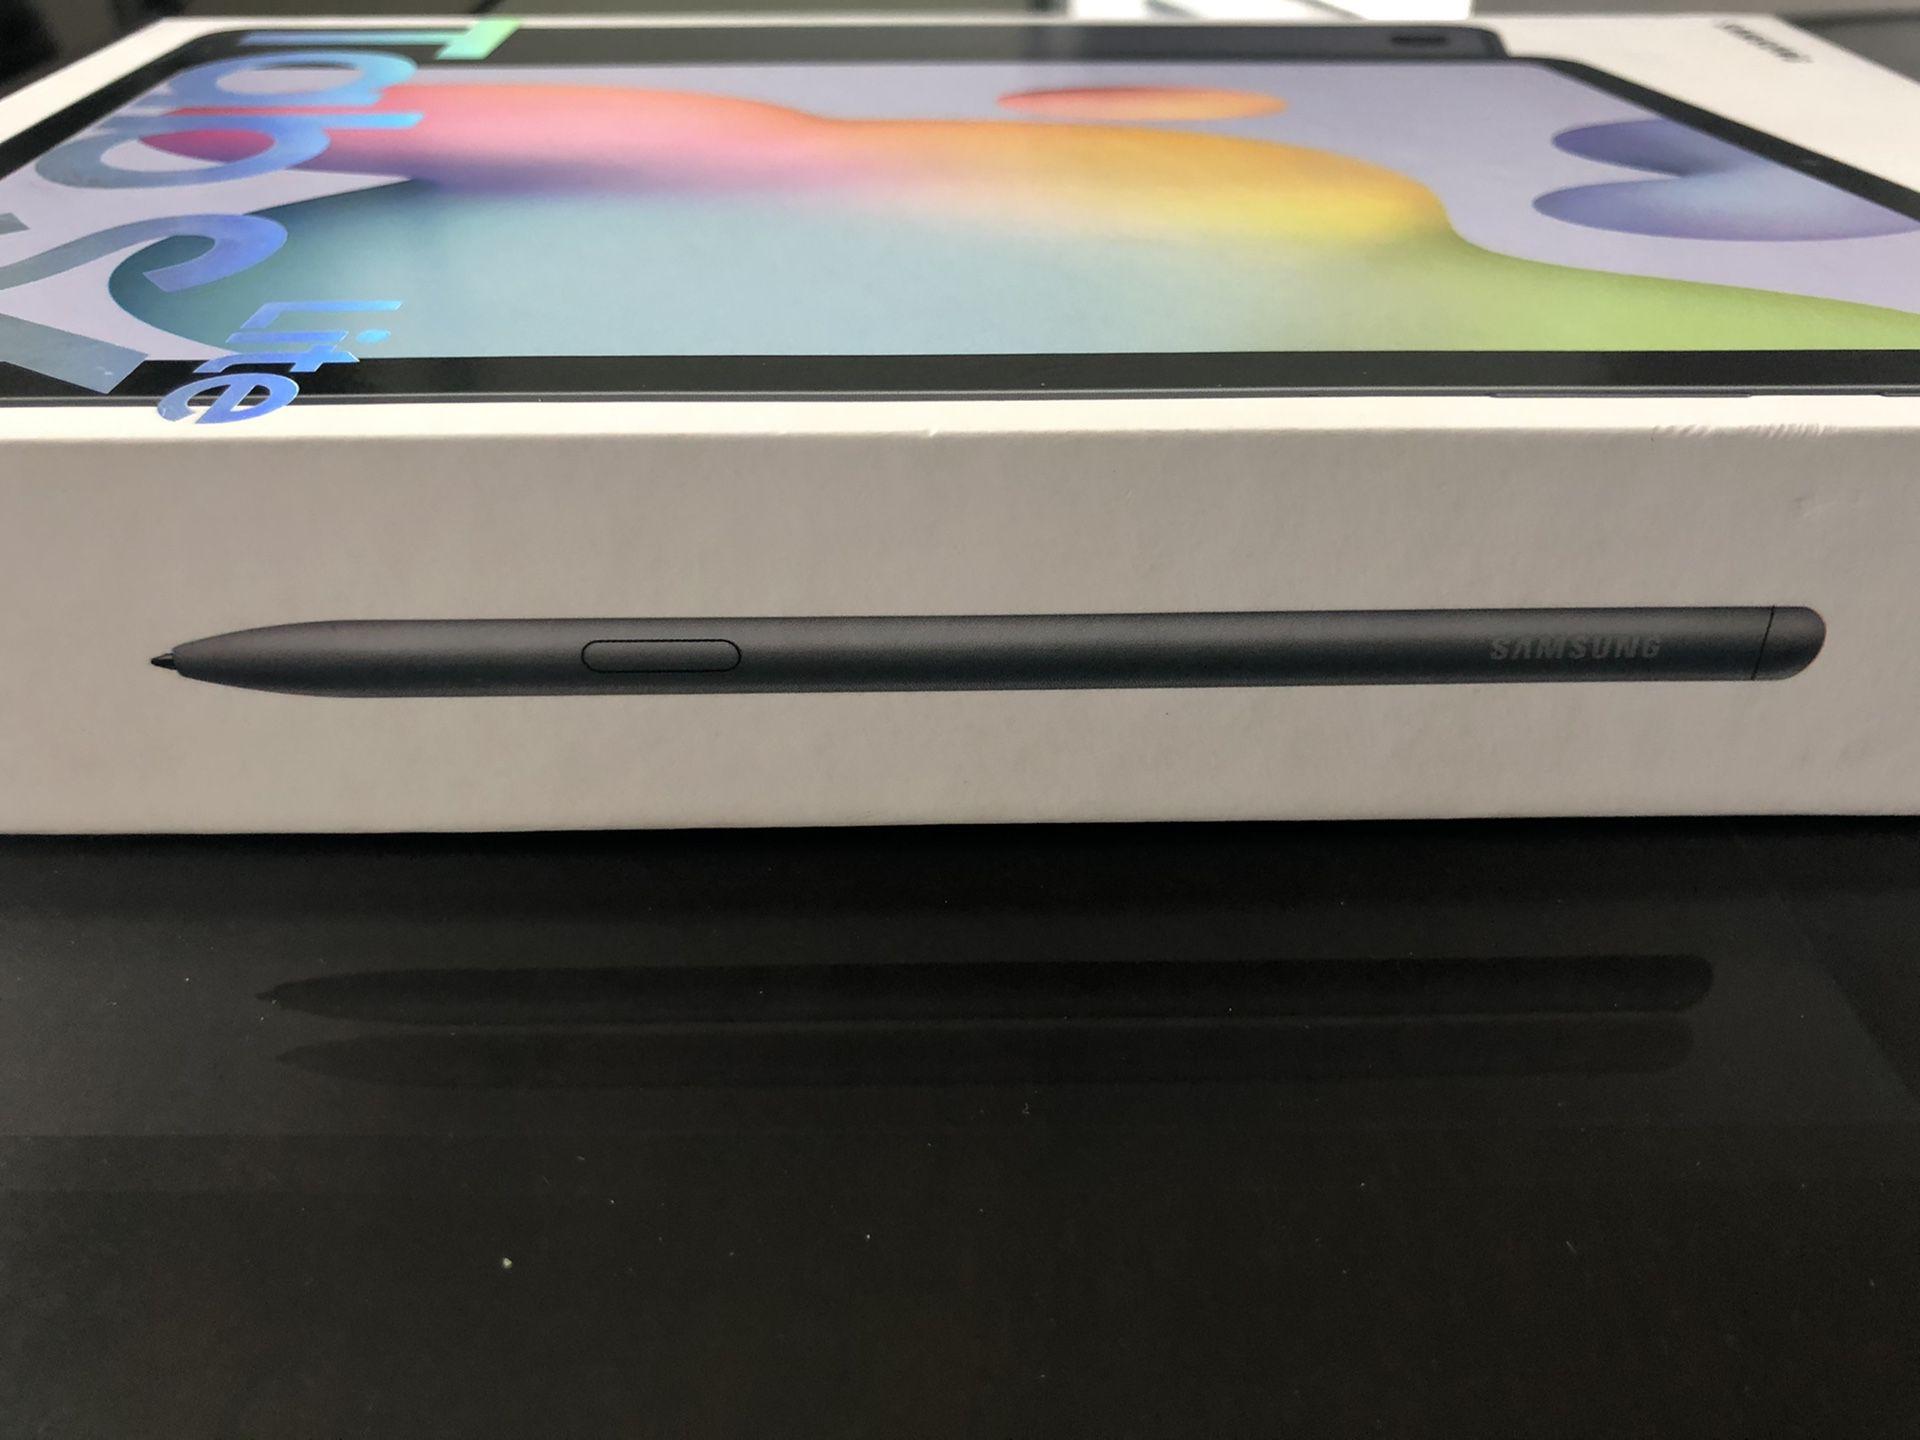 Samsung 10.4 inch Galaxy Tablet S6 Lite w/ Pen - OXFORD GRAY.